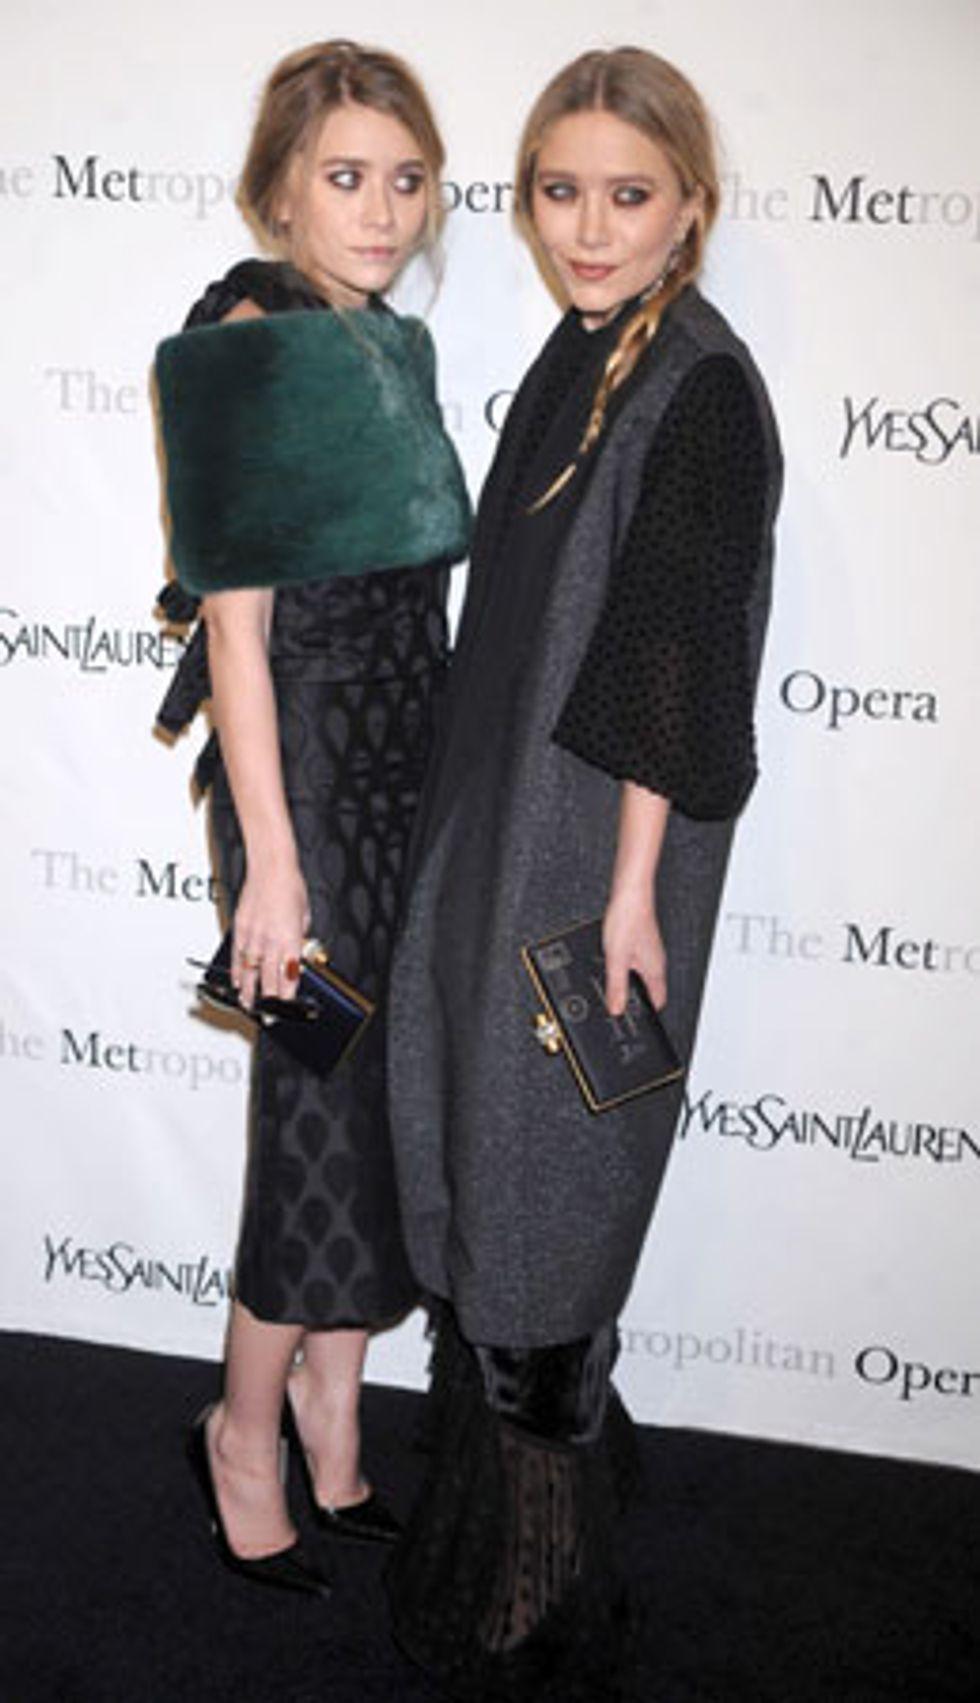 Yves Saint Laurent Sponsors the Metropolitan Opera's Premiere of Le Comte Ory